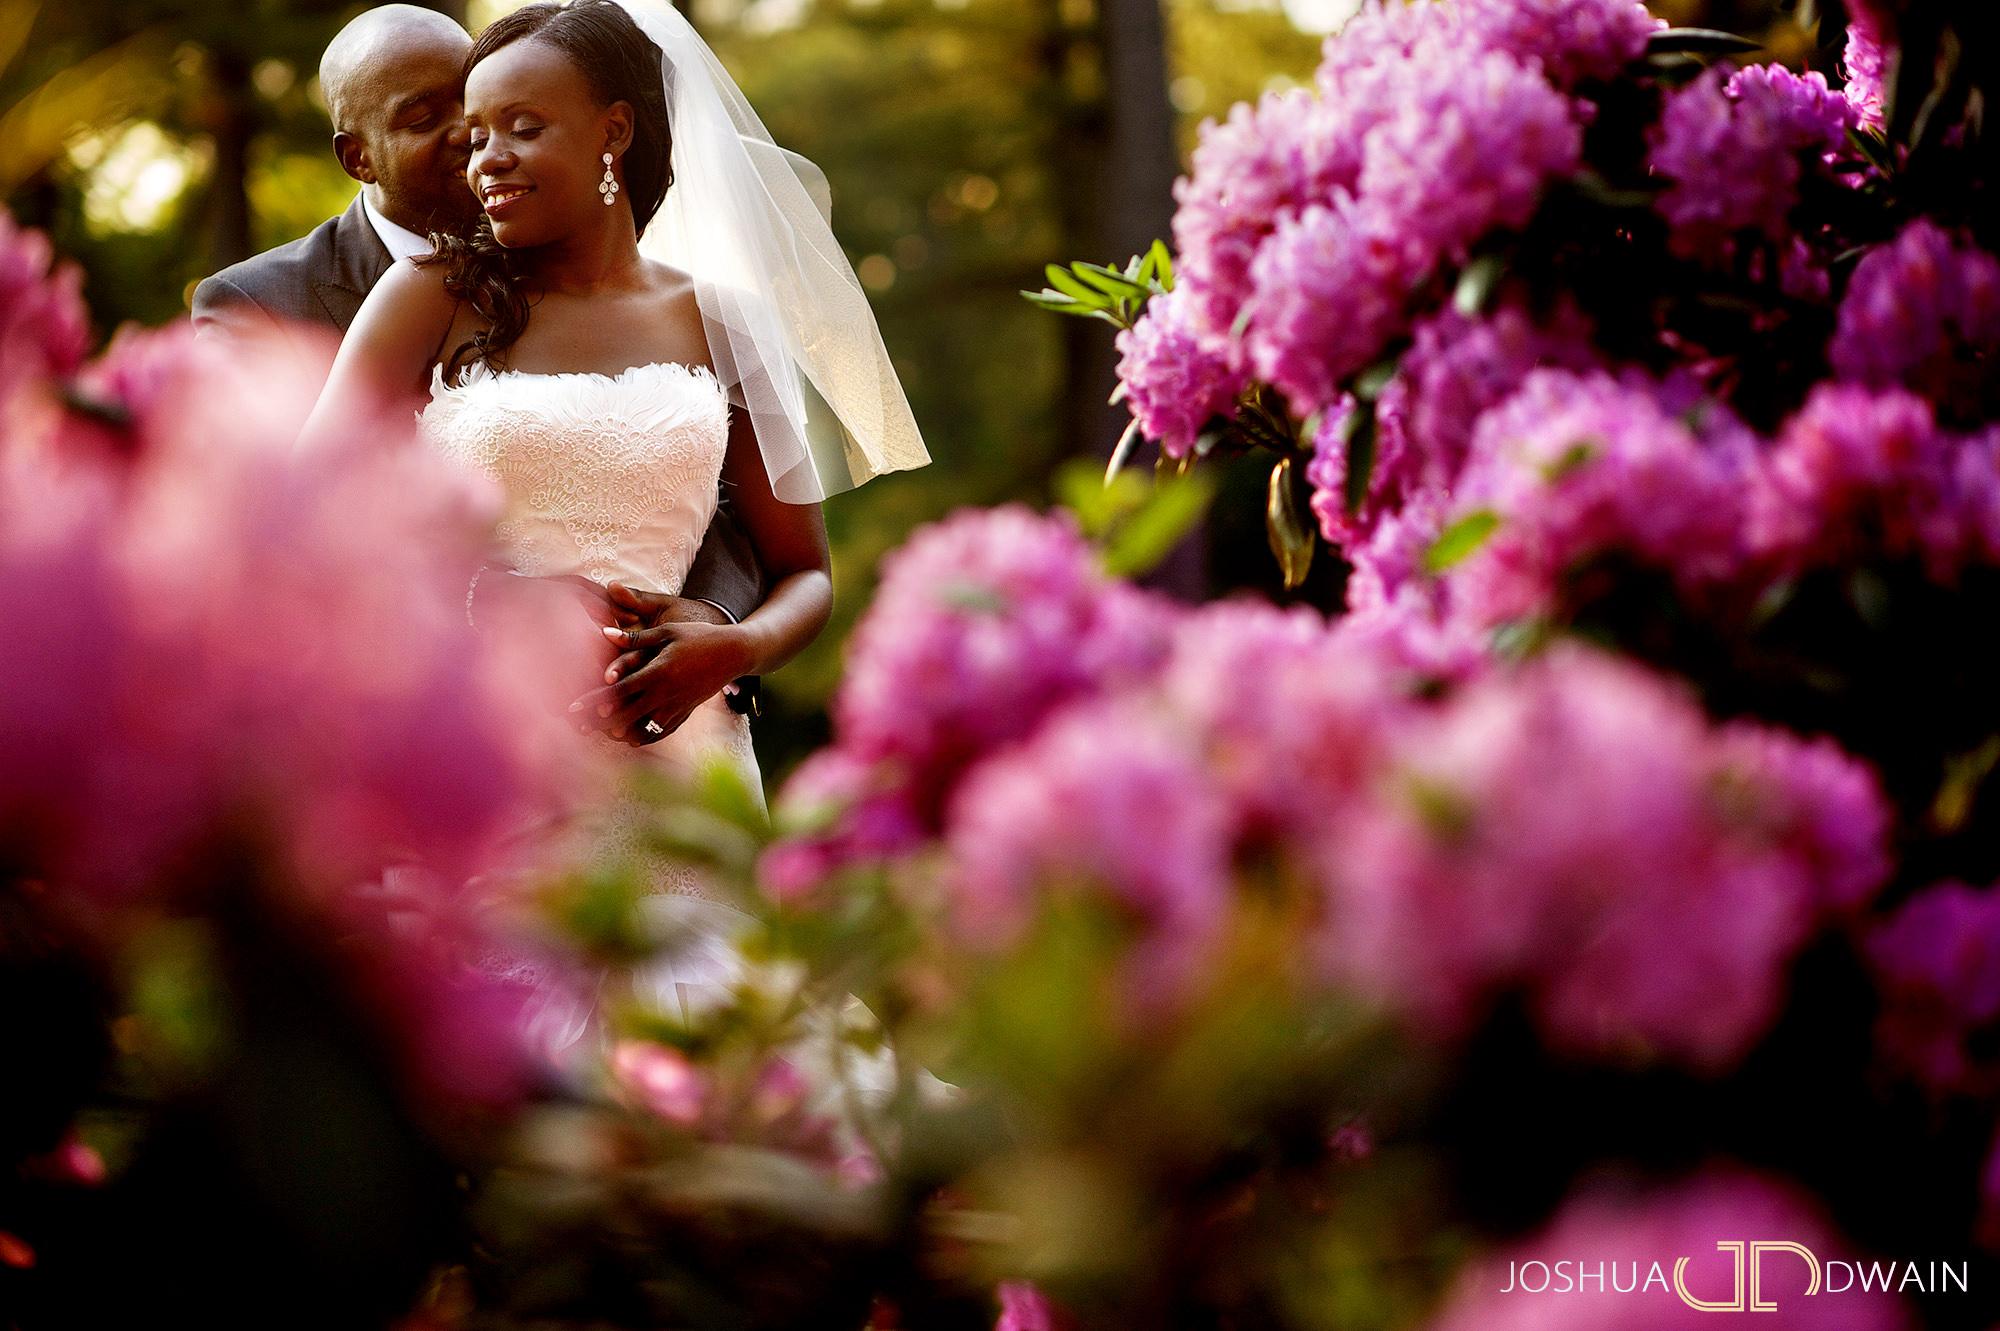 nancy-jason-015-wadsworth-estates-middletown-ct-wedding-photographer-joshua-dwain-photography-